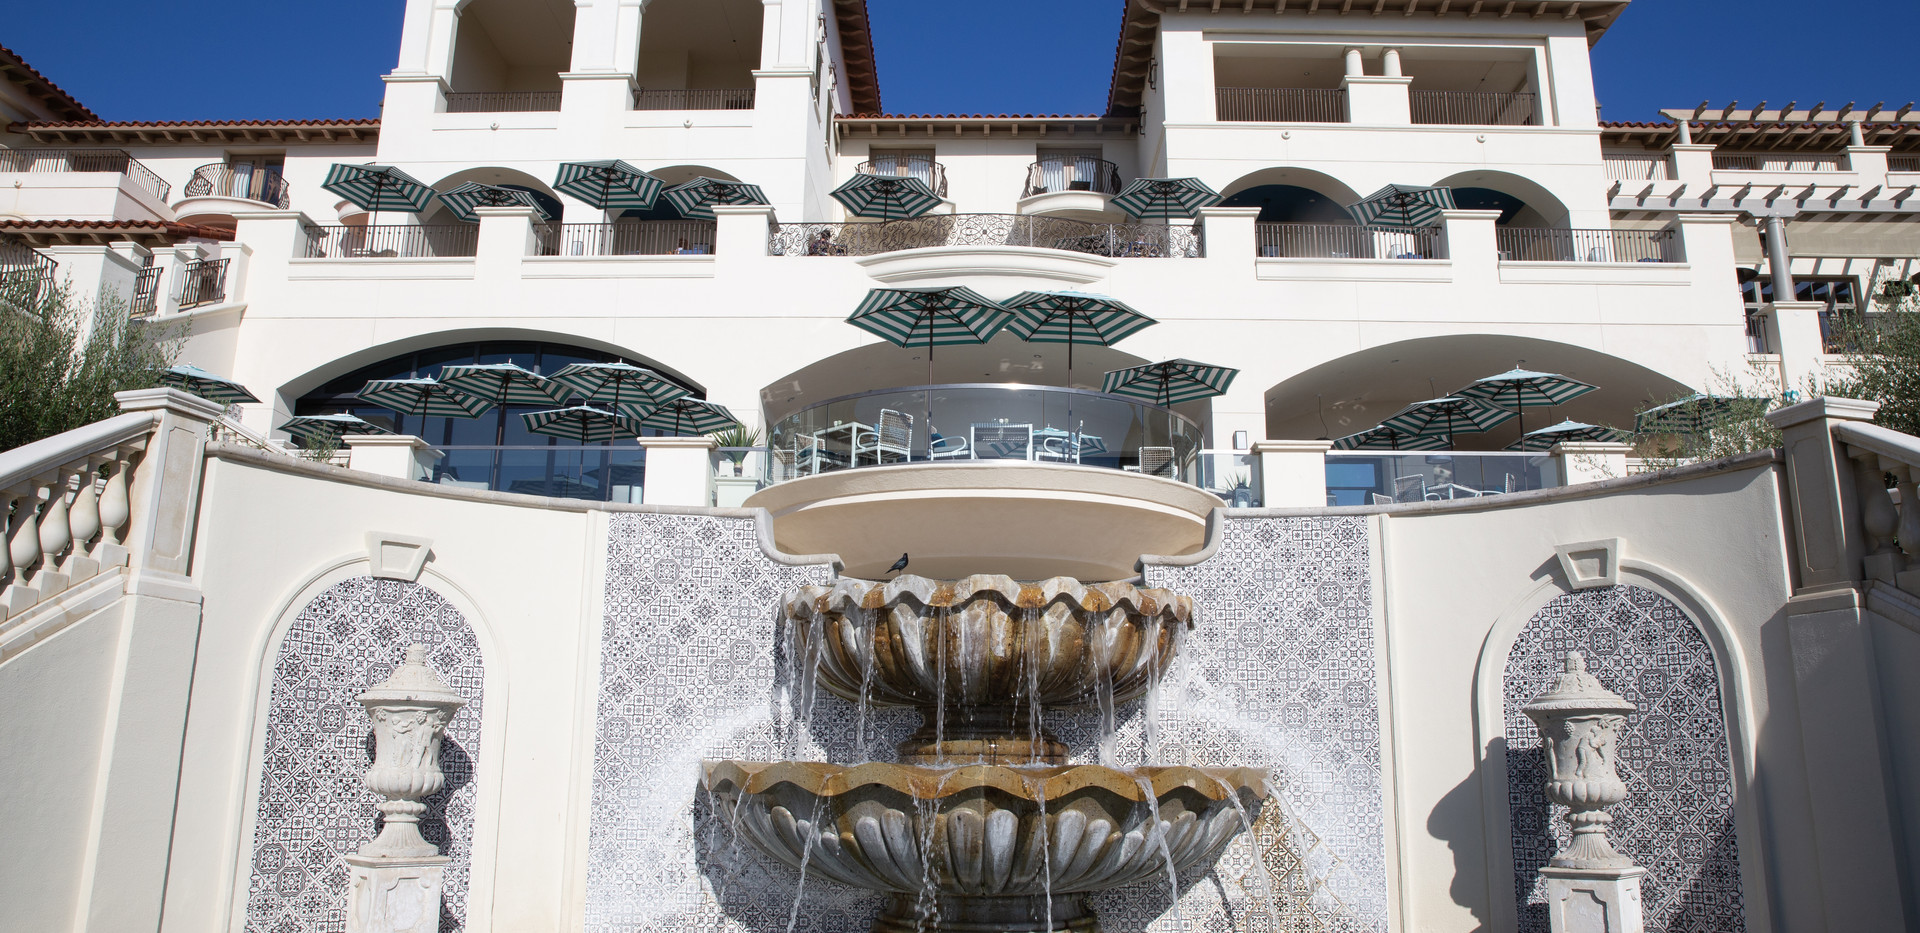 ResortFountain-81.jpg